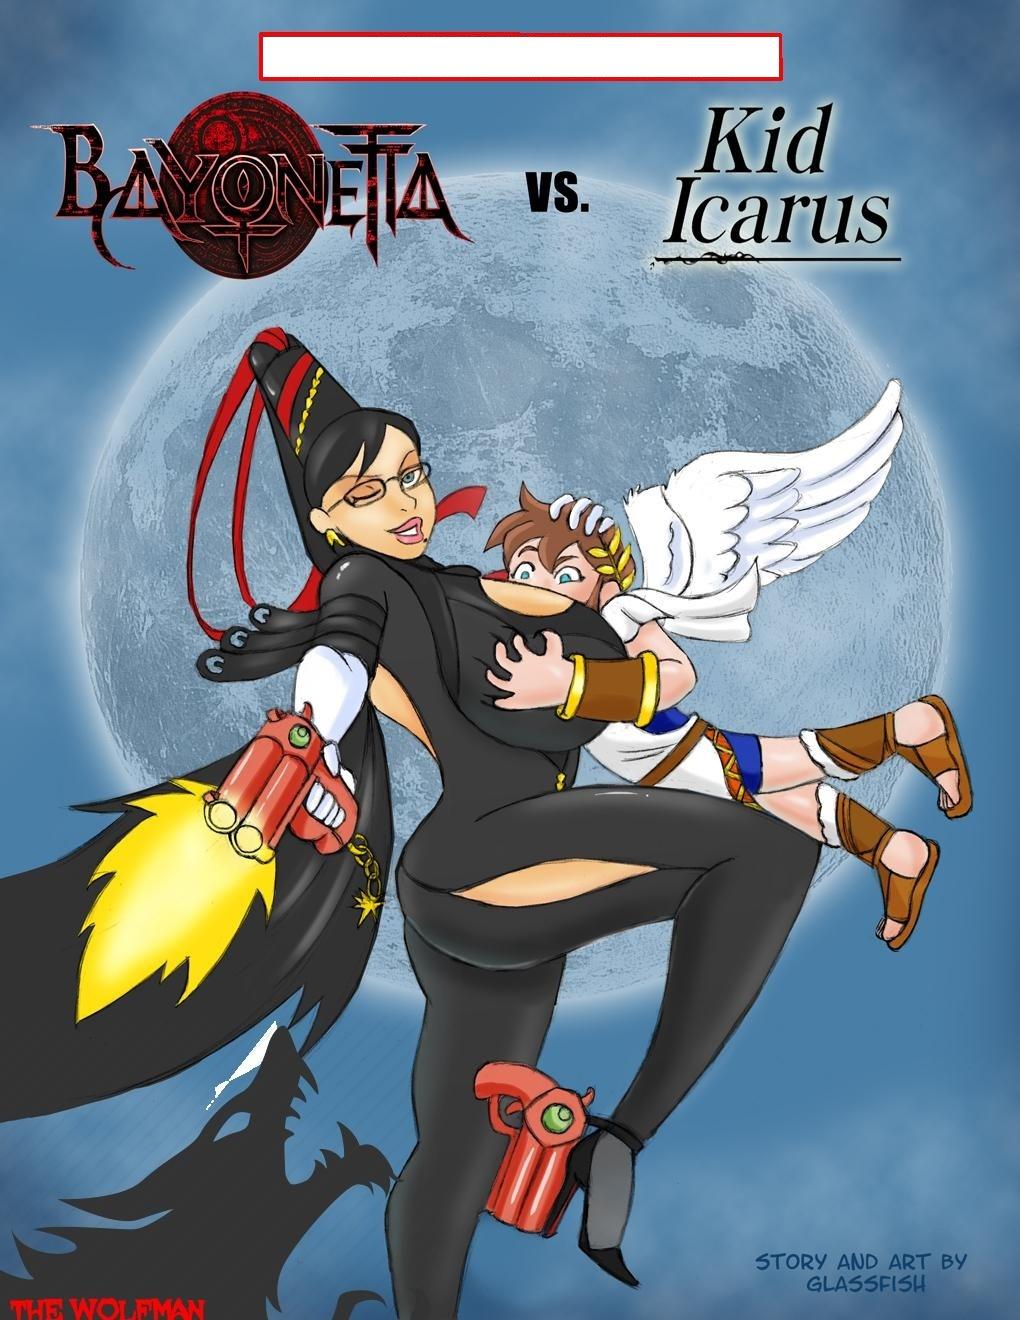 Bayonetta vs Kid Ikarus 4